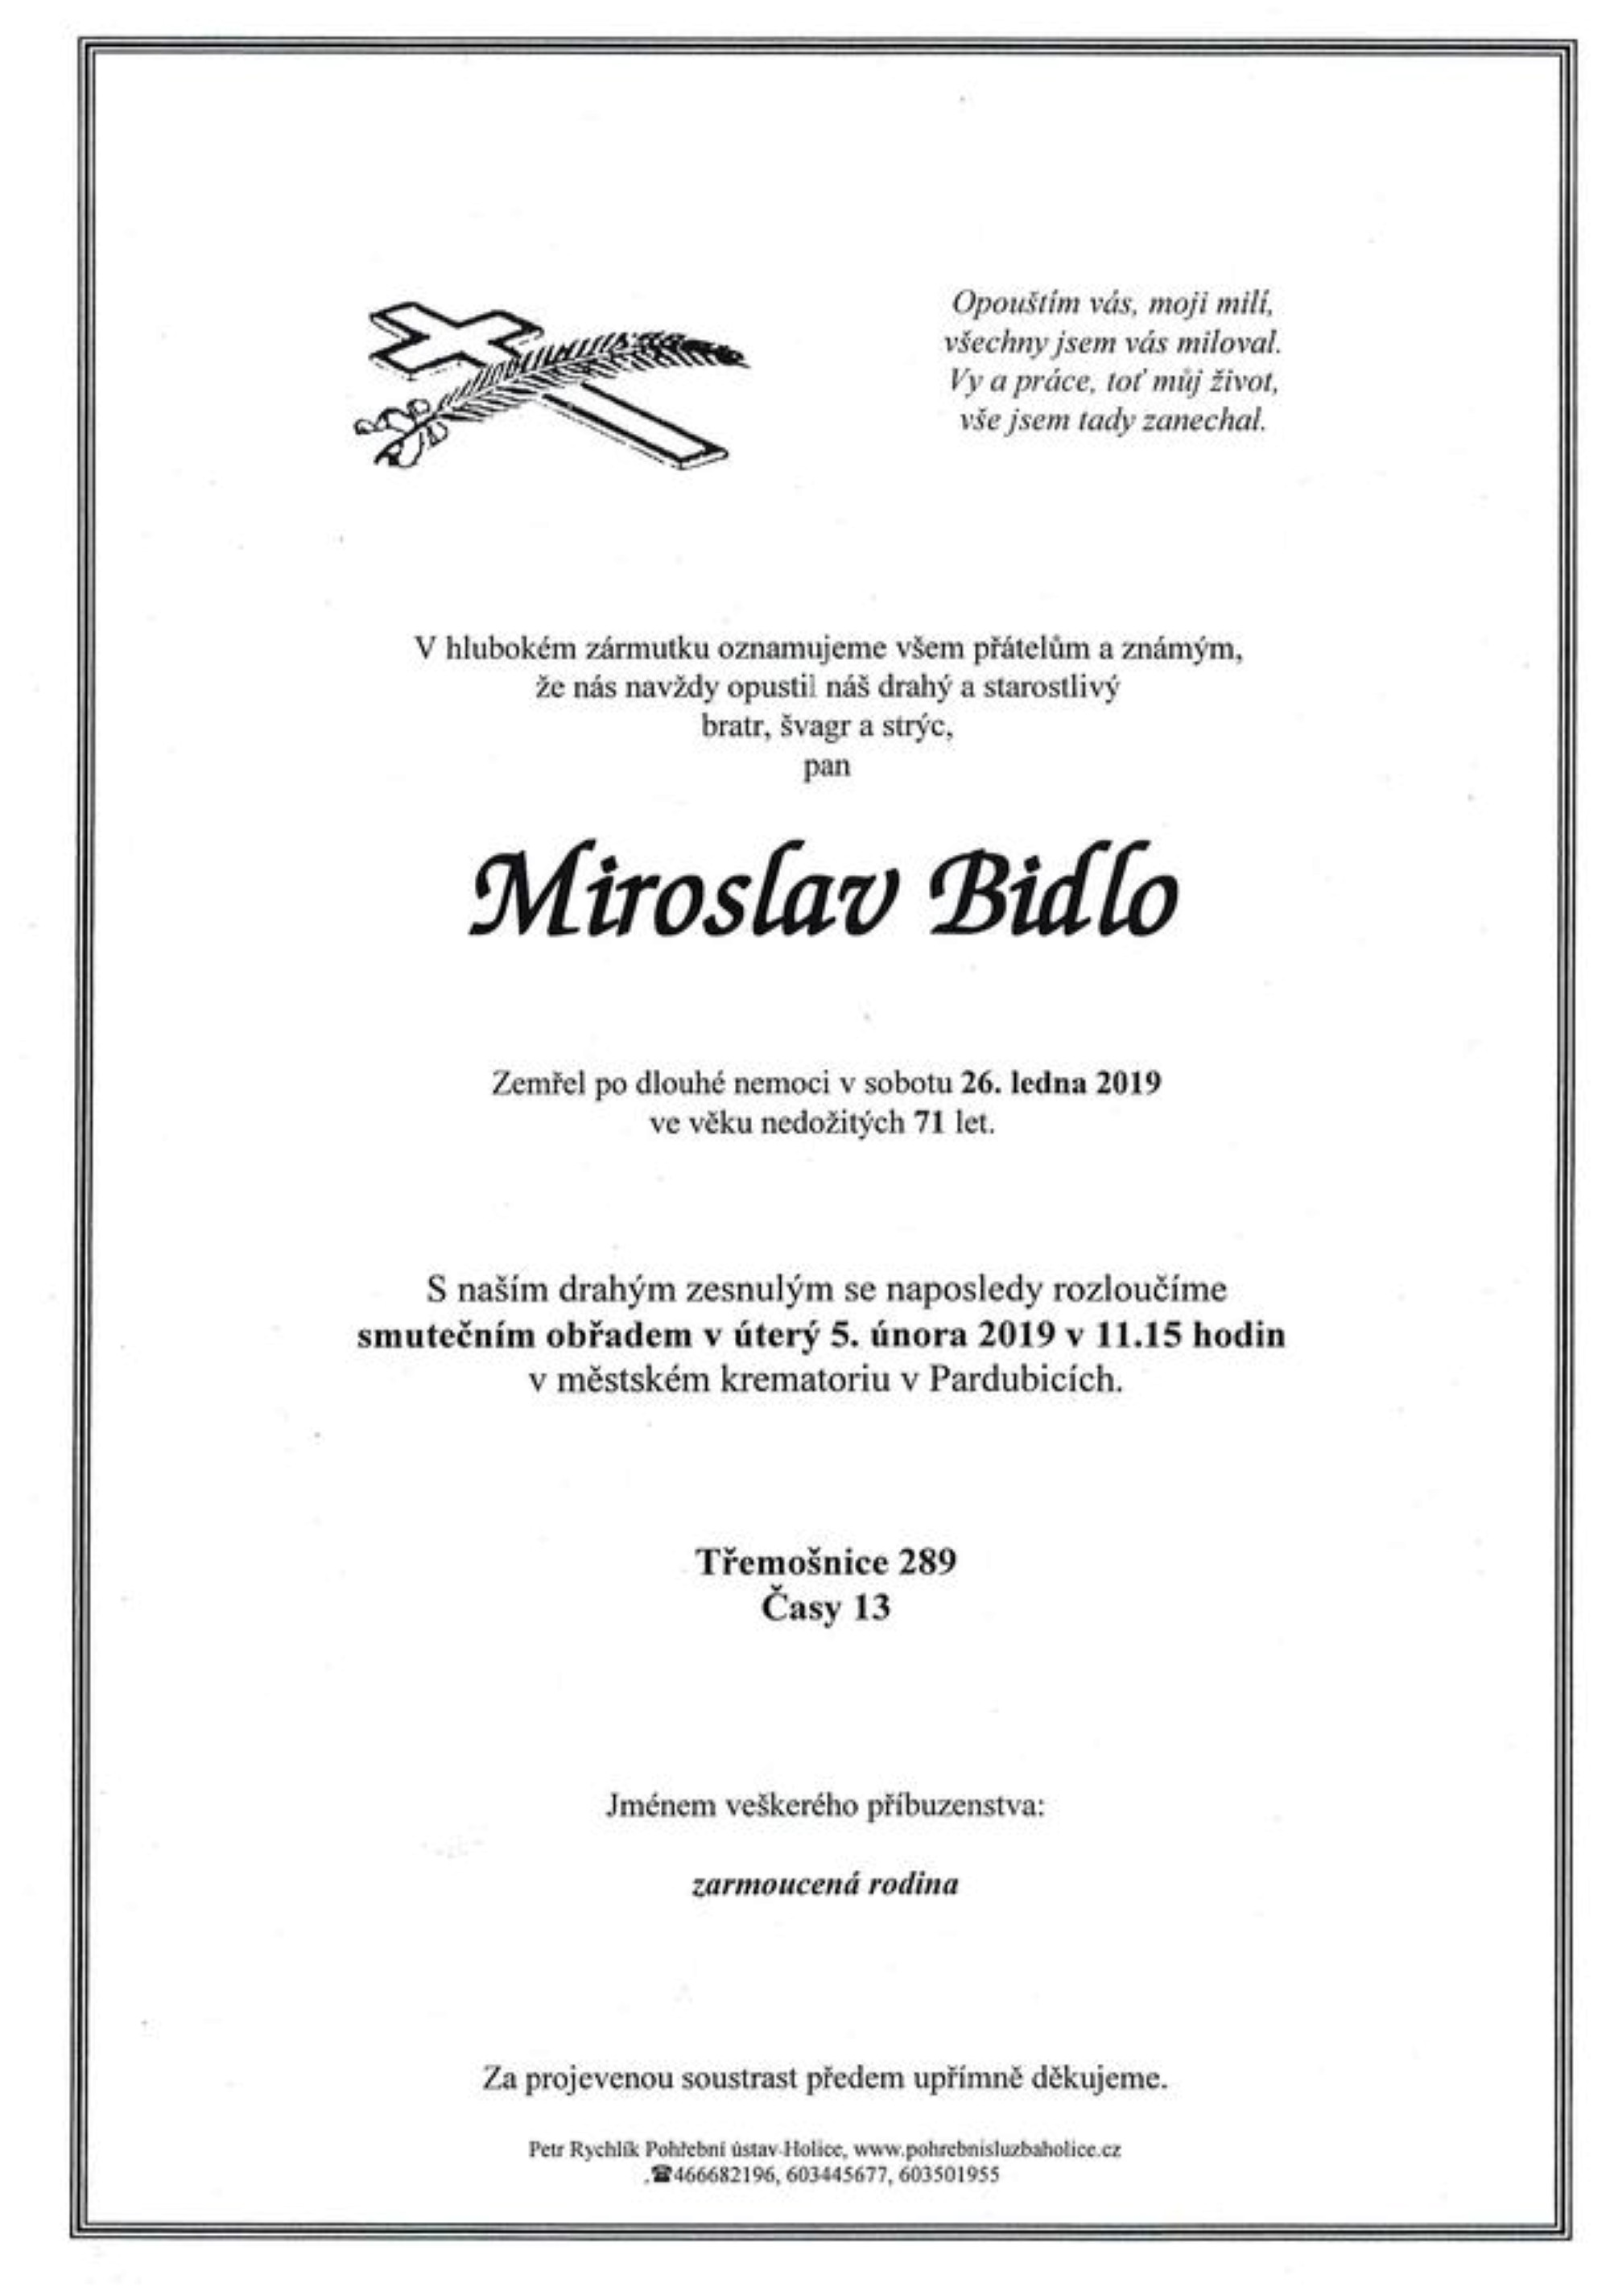 Miroslav Bidlo